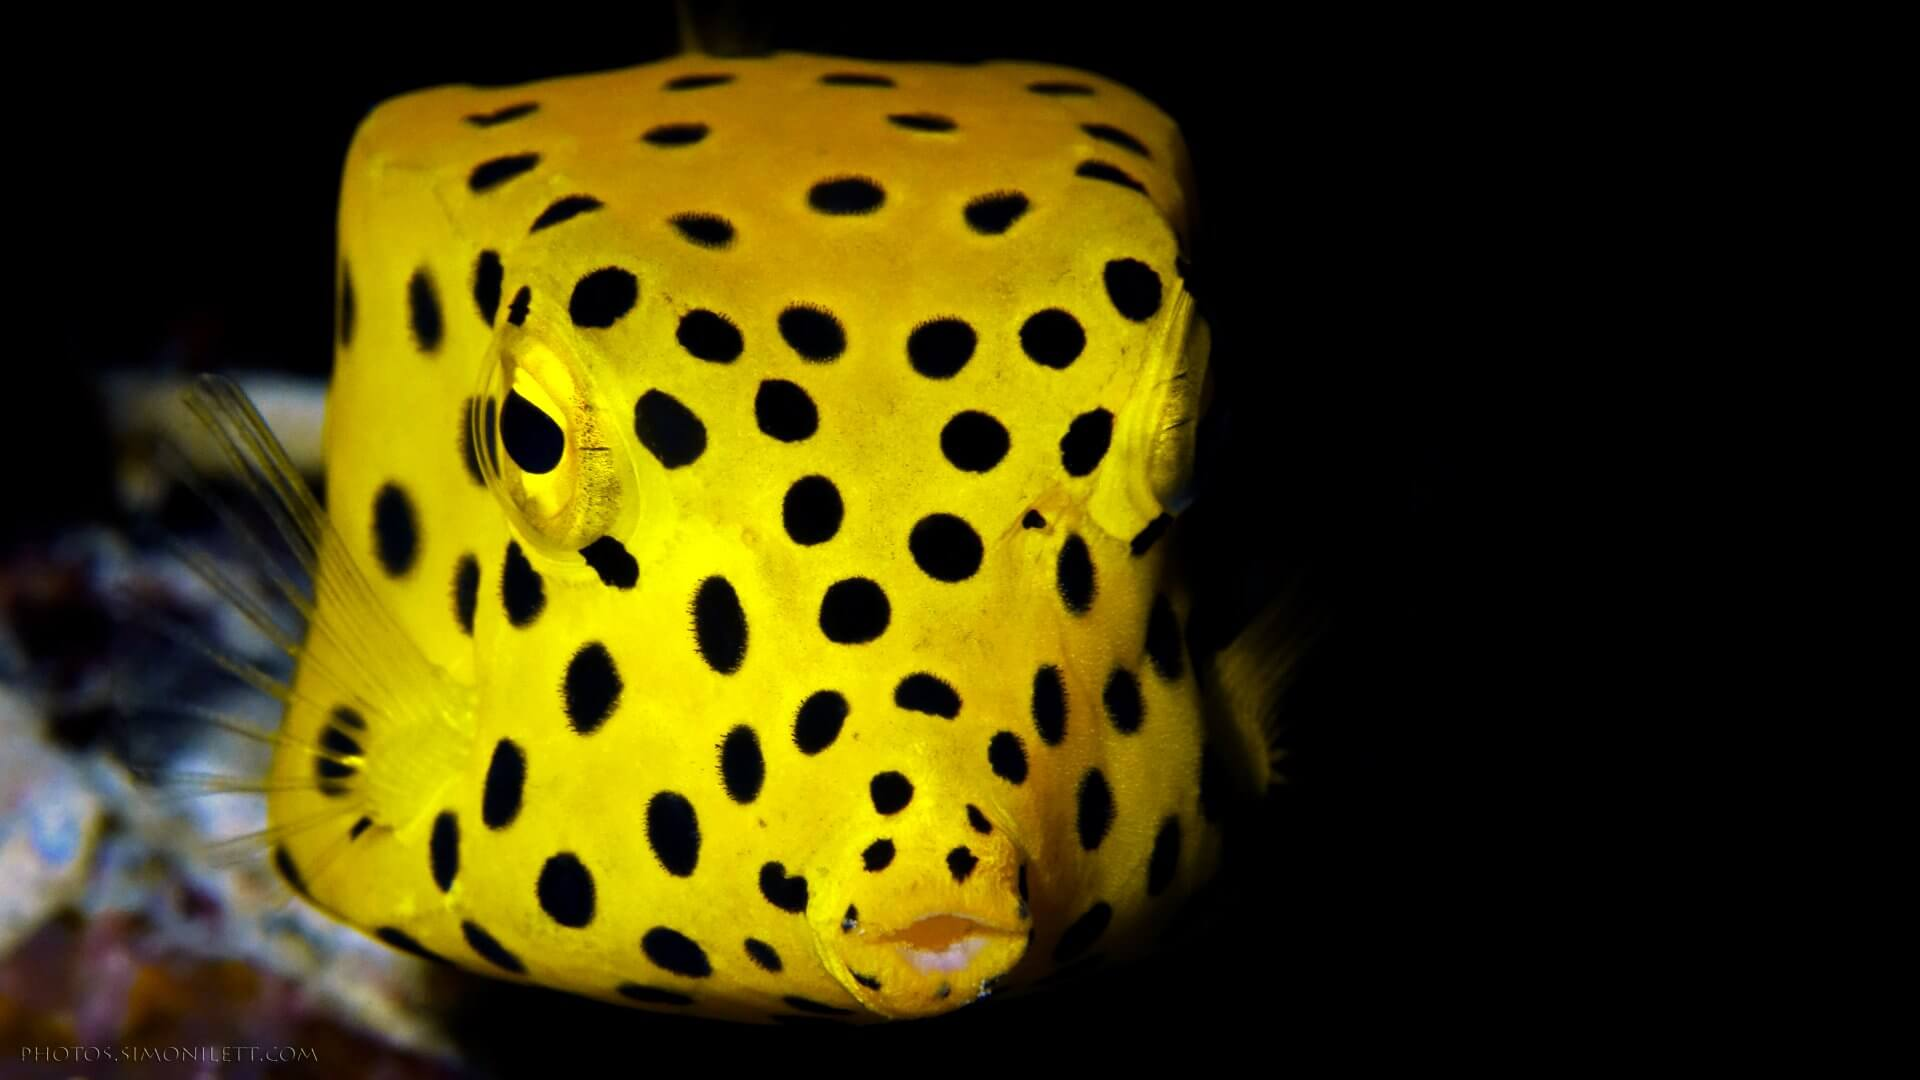 The Juvenile Yellow Box Fish 2